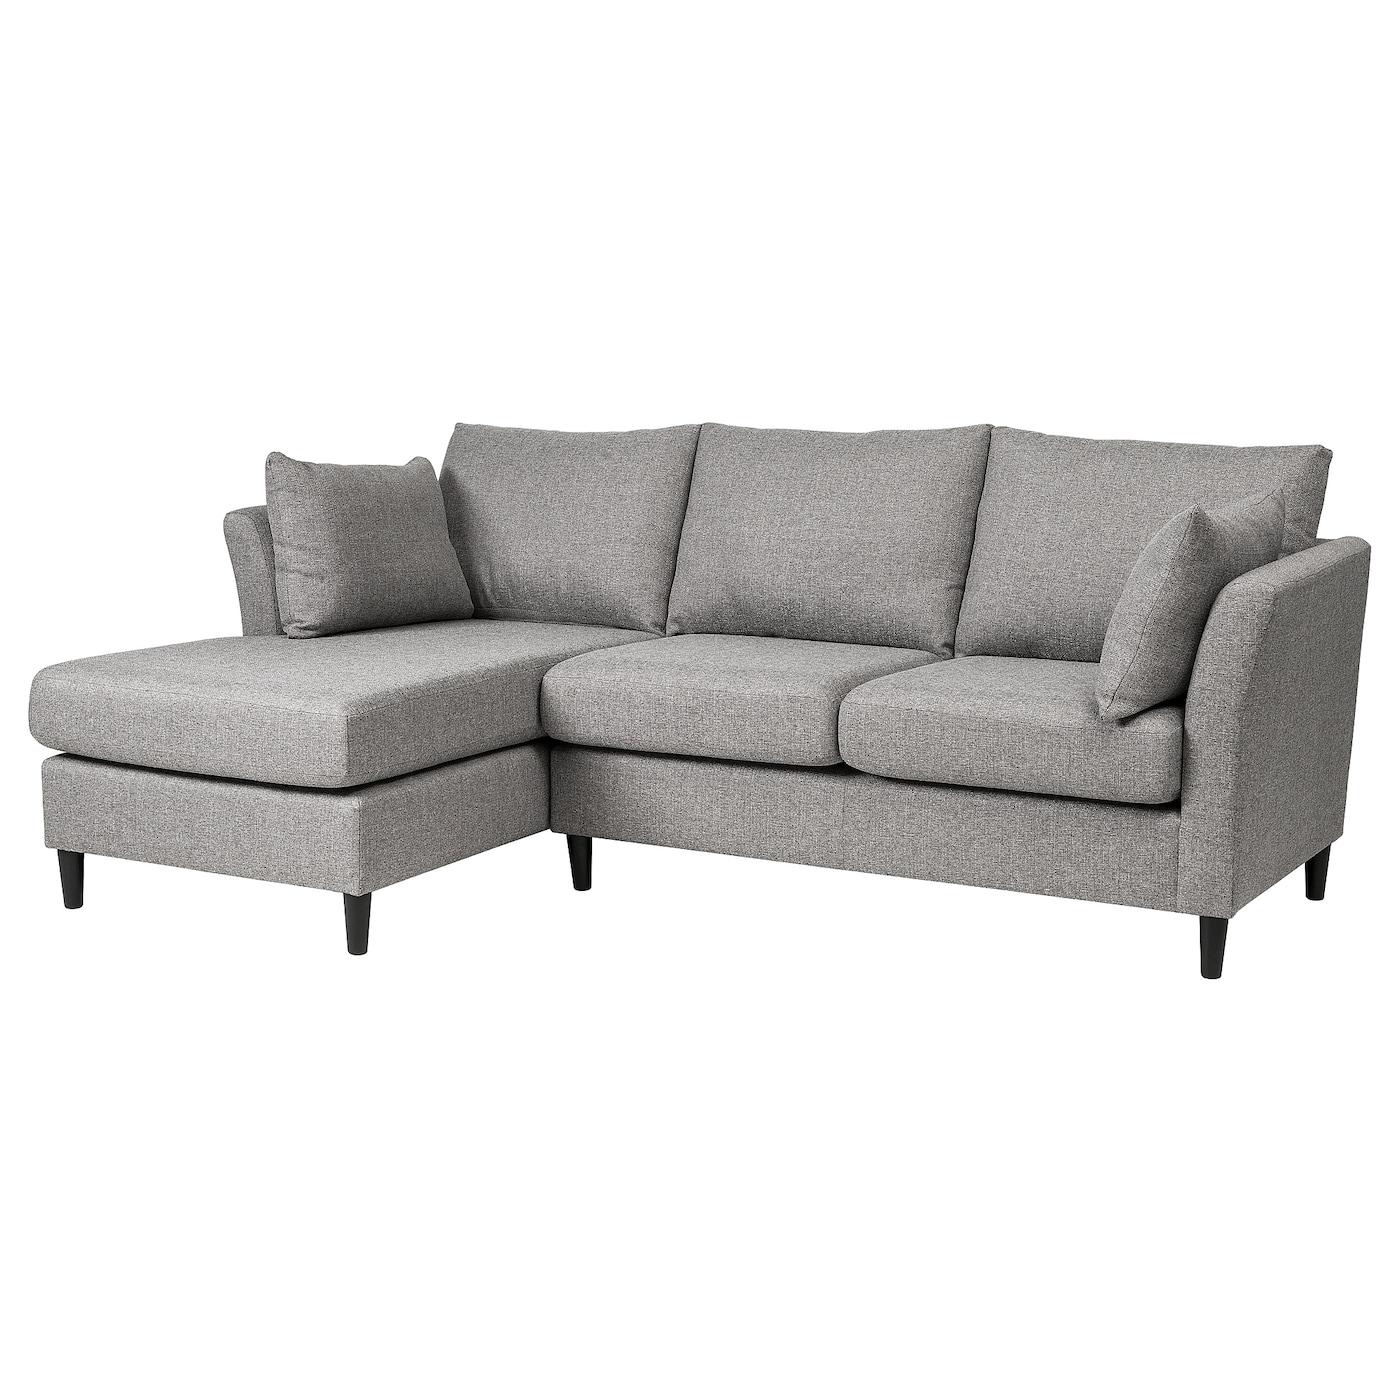 Three seater sofas ikea ireland dublin for Sofa chester chaise longue